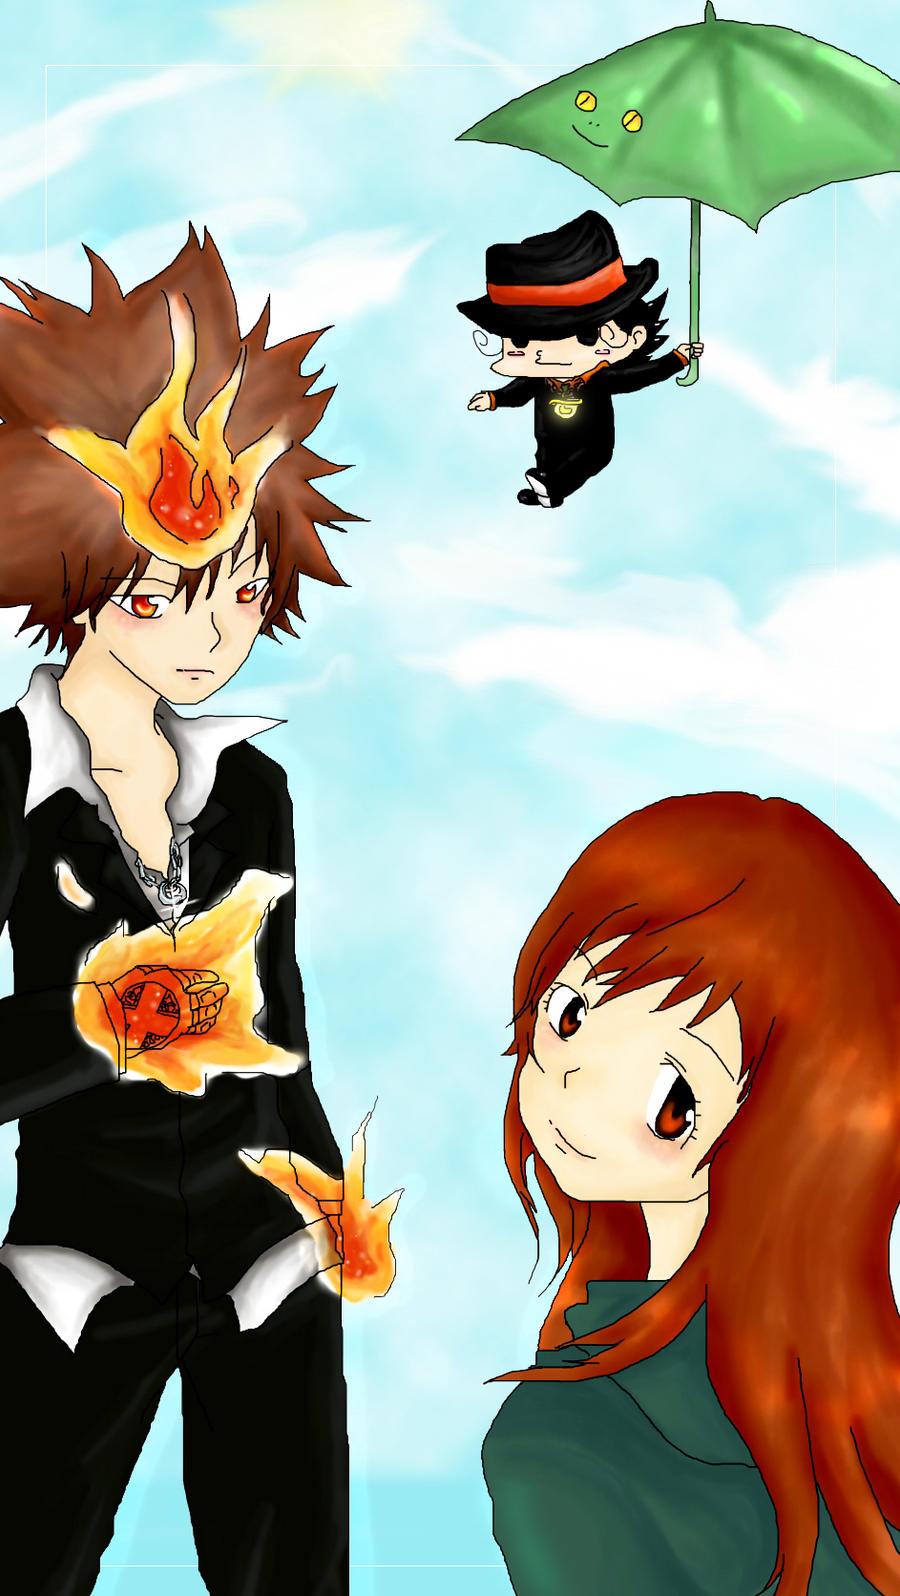 tsuna kyoko and reborn by rui09 on deviantart